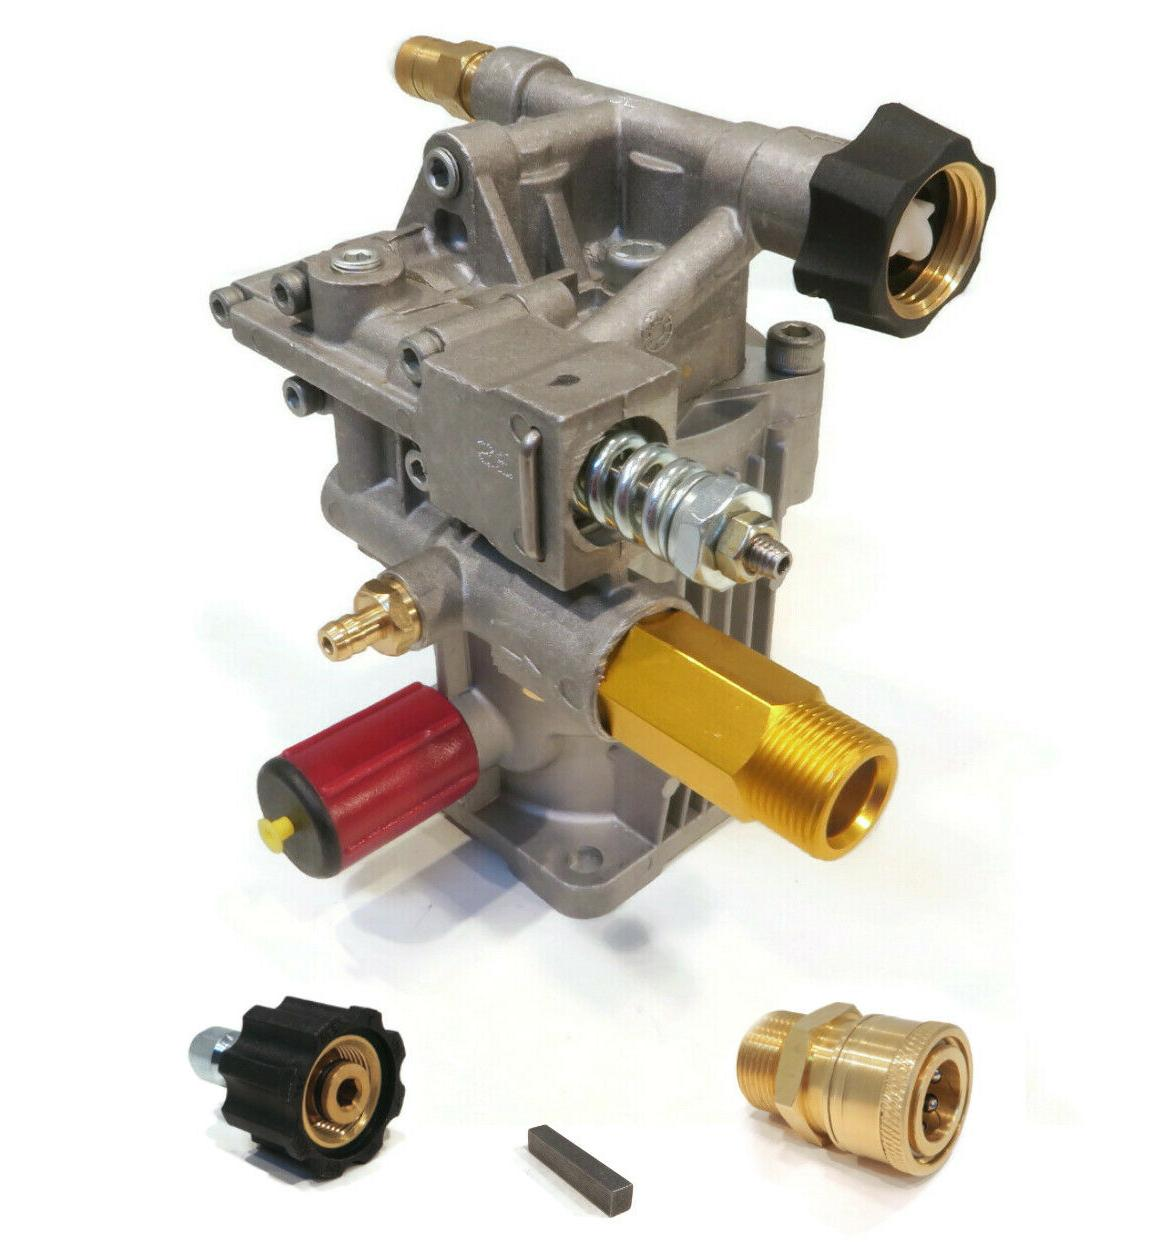 PRESSURE WASHER PUMP & Quick Connect fits Karcher Power Wash